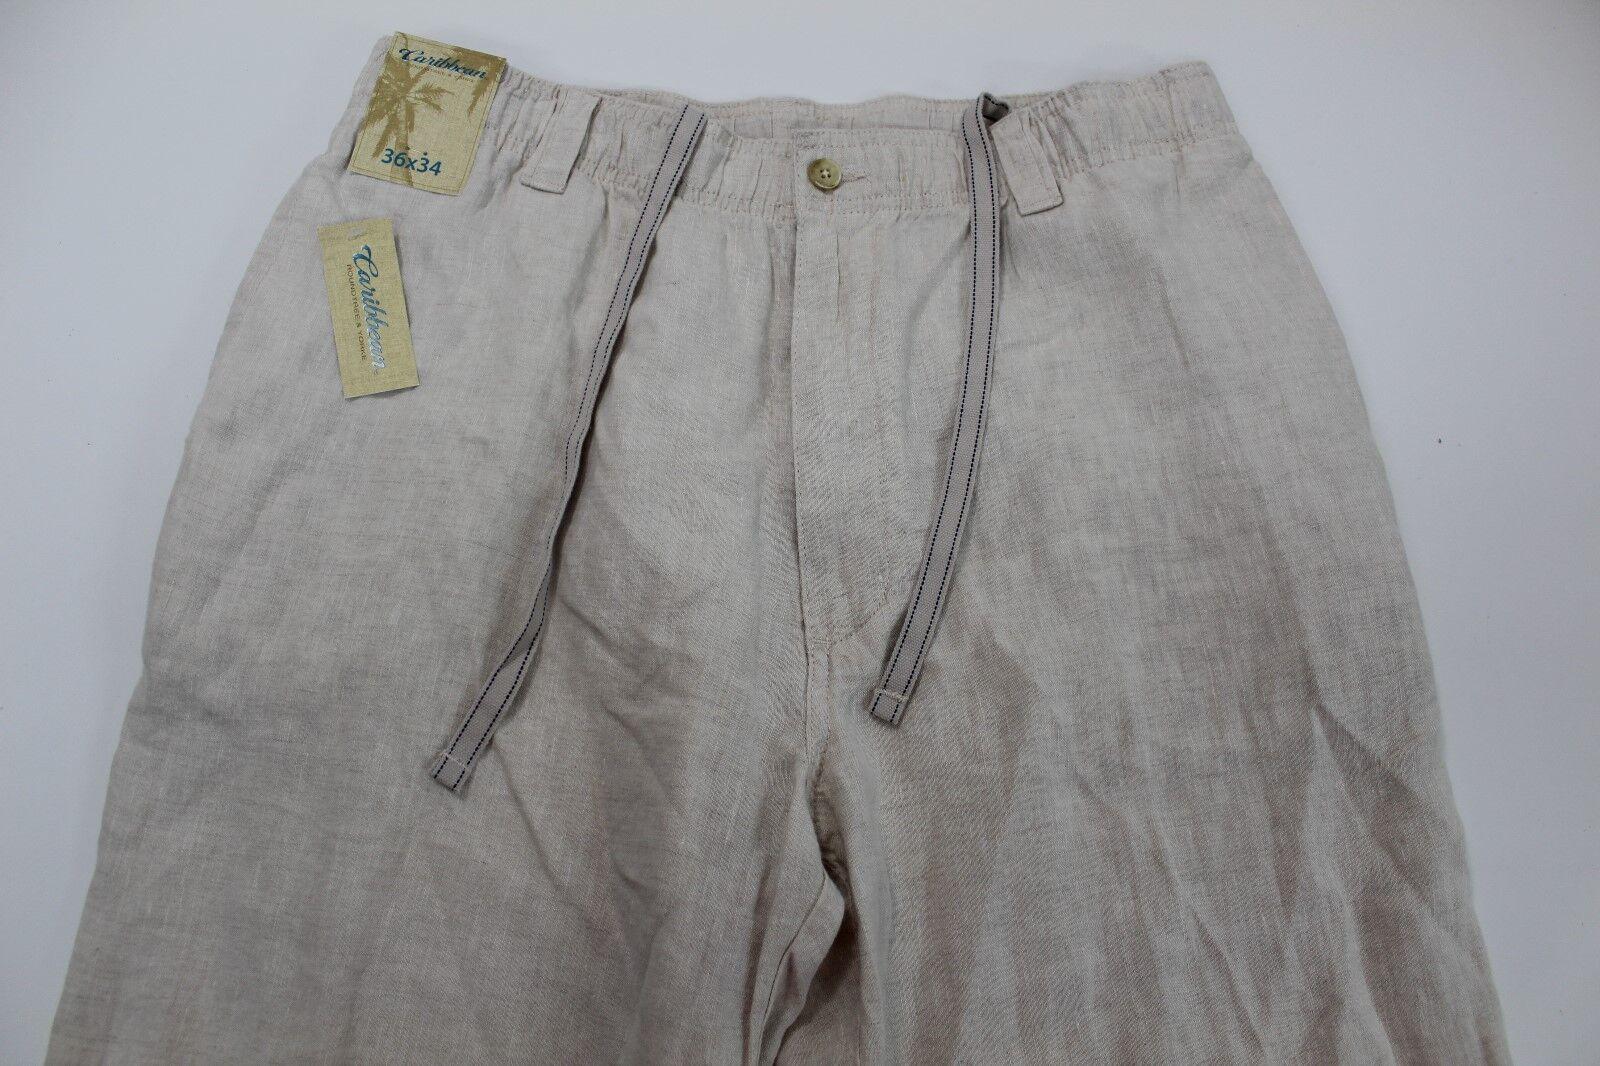 Caribbean Linen Pants Mens 36 x 34 Dressy Front NWT